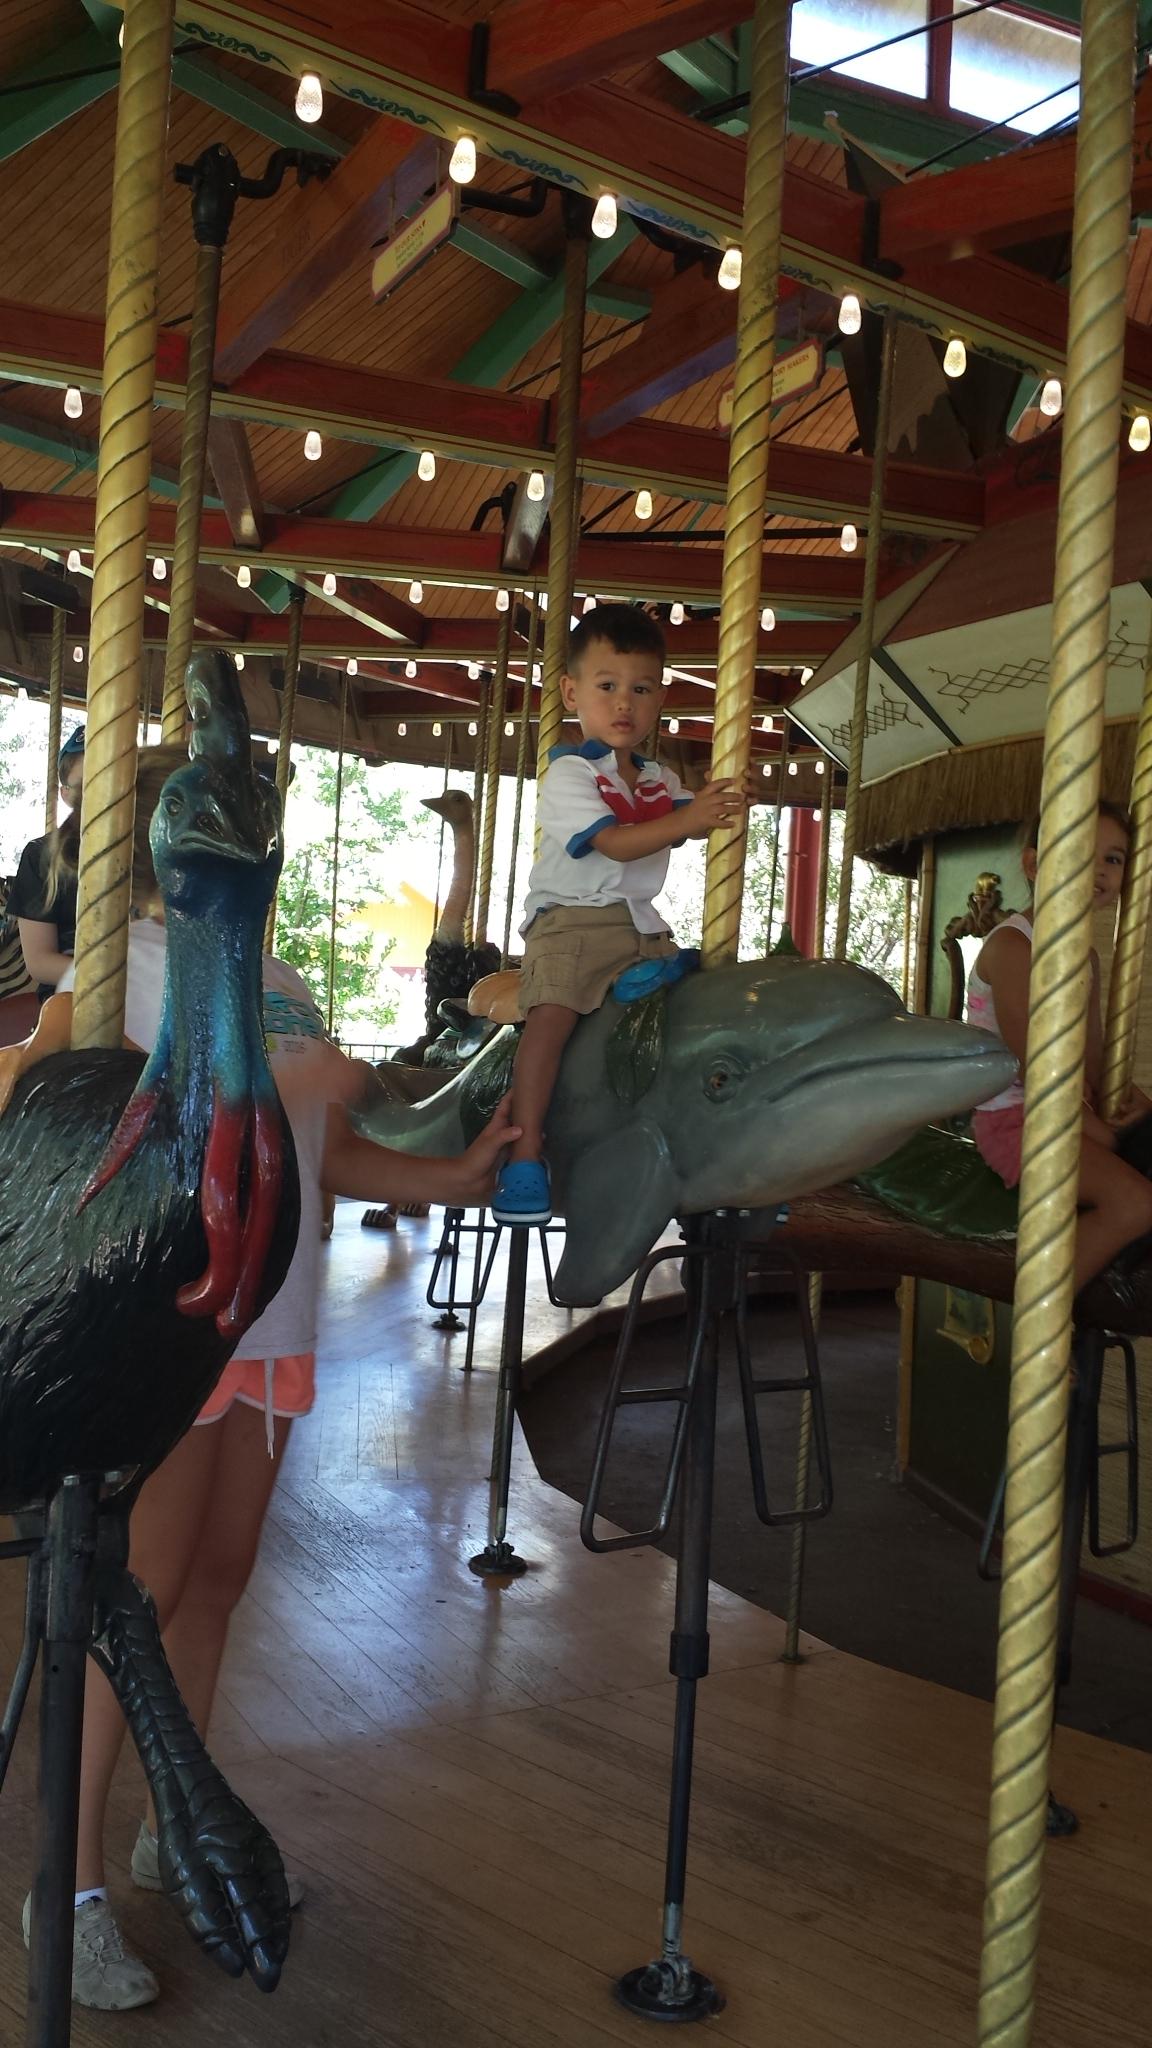 Cole on carousel